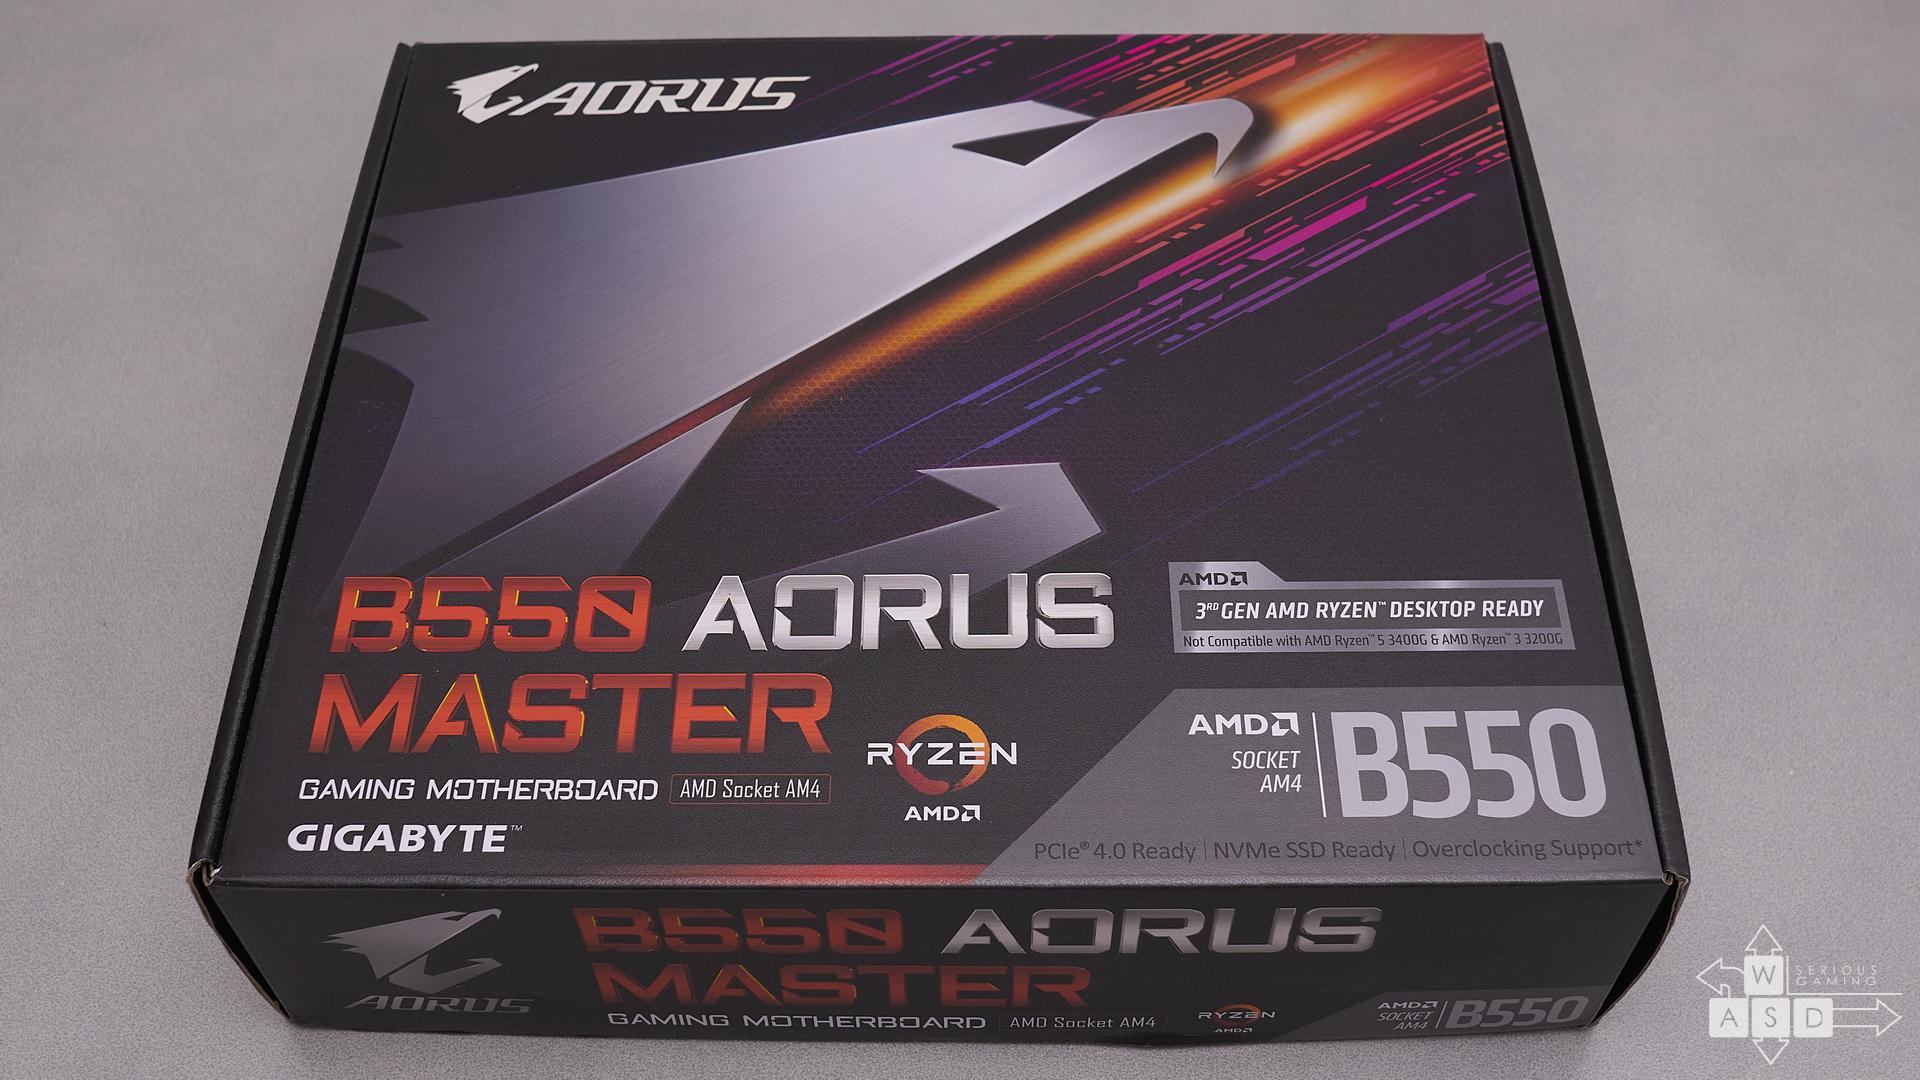 Aorus B550 Master | WASD